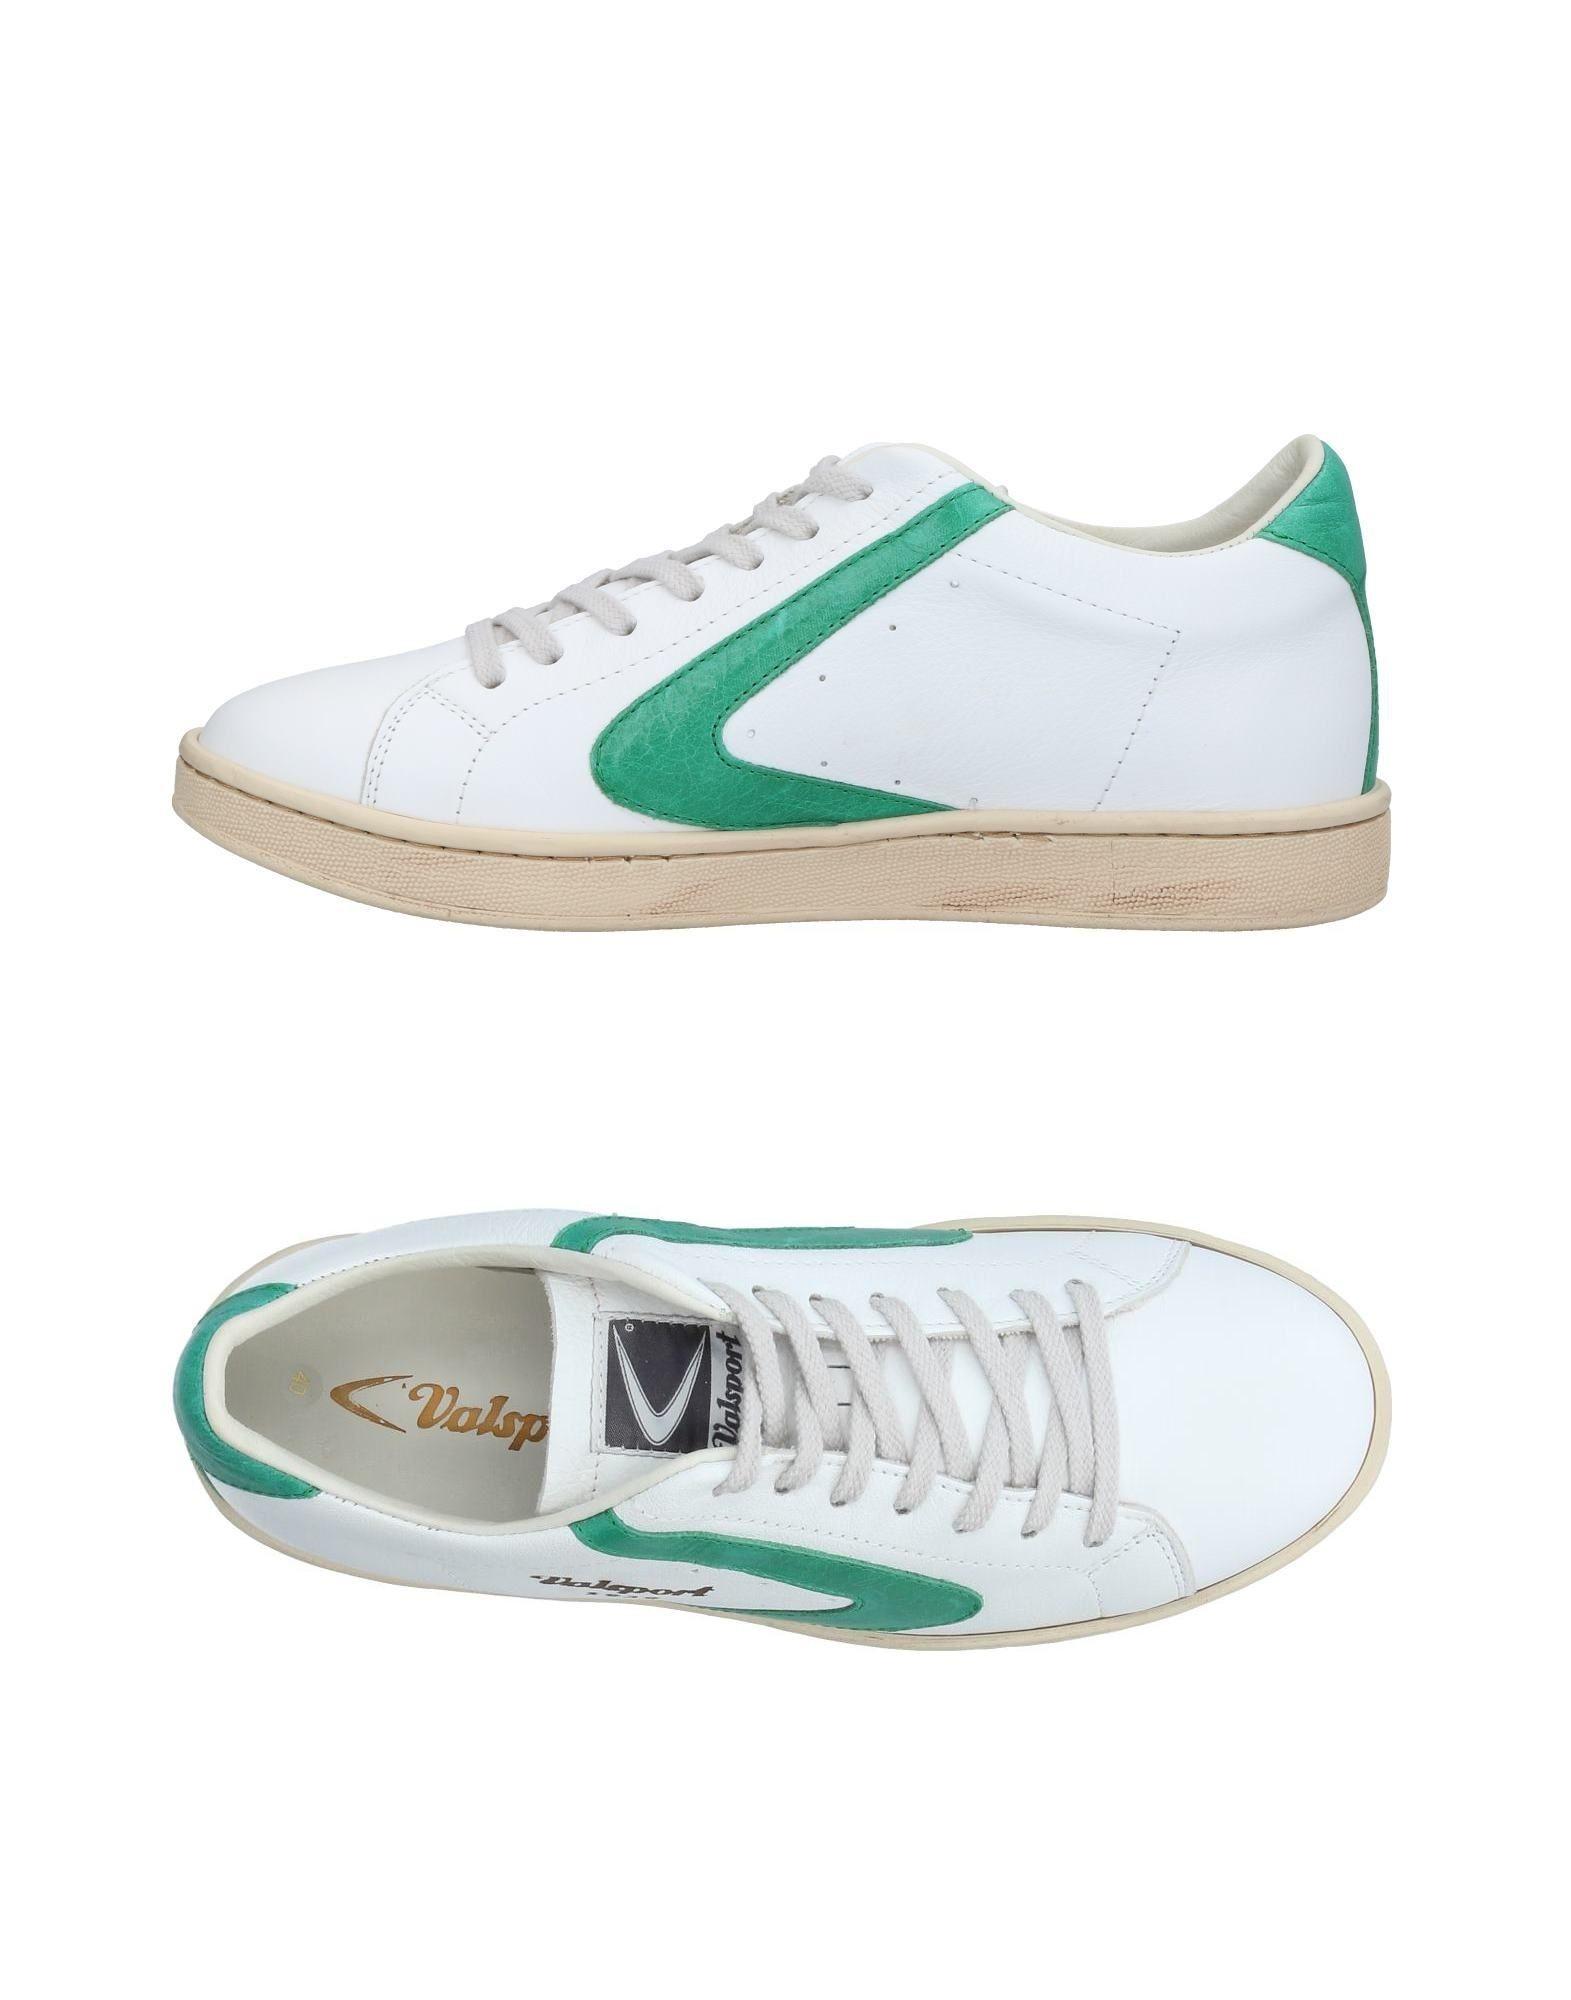 Sneakers Valsport Donna - Acquista online su